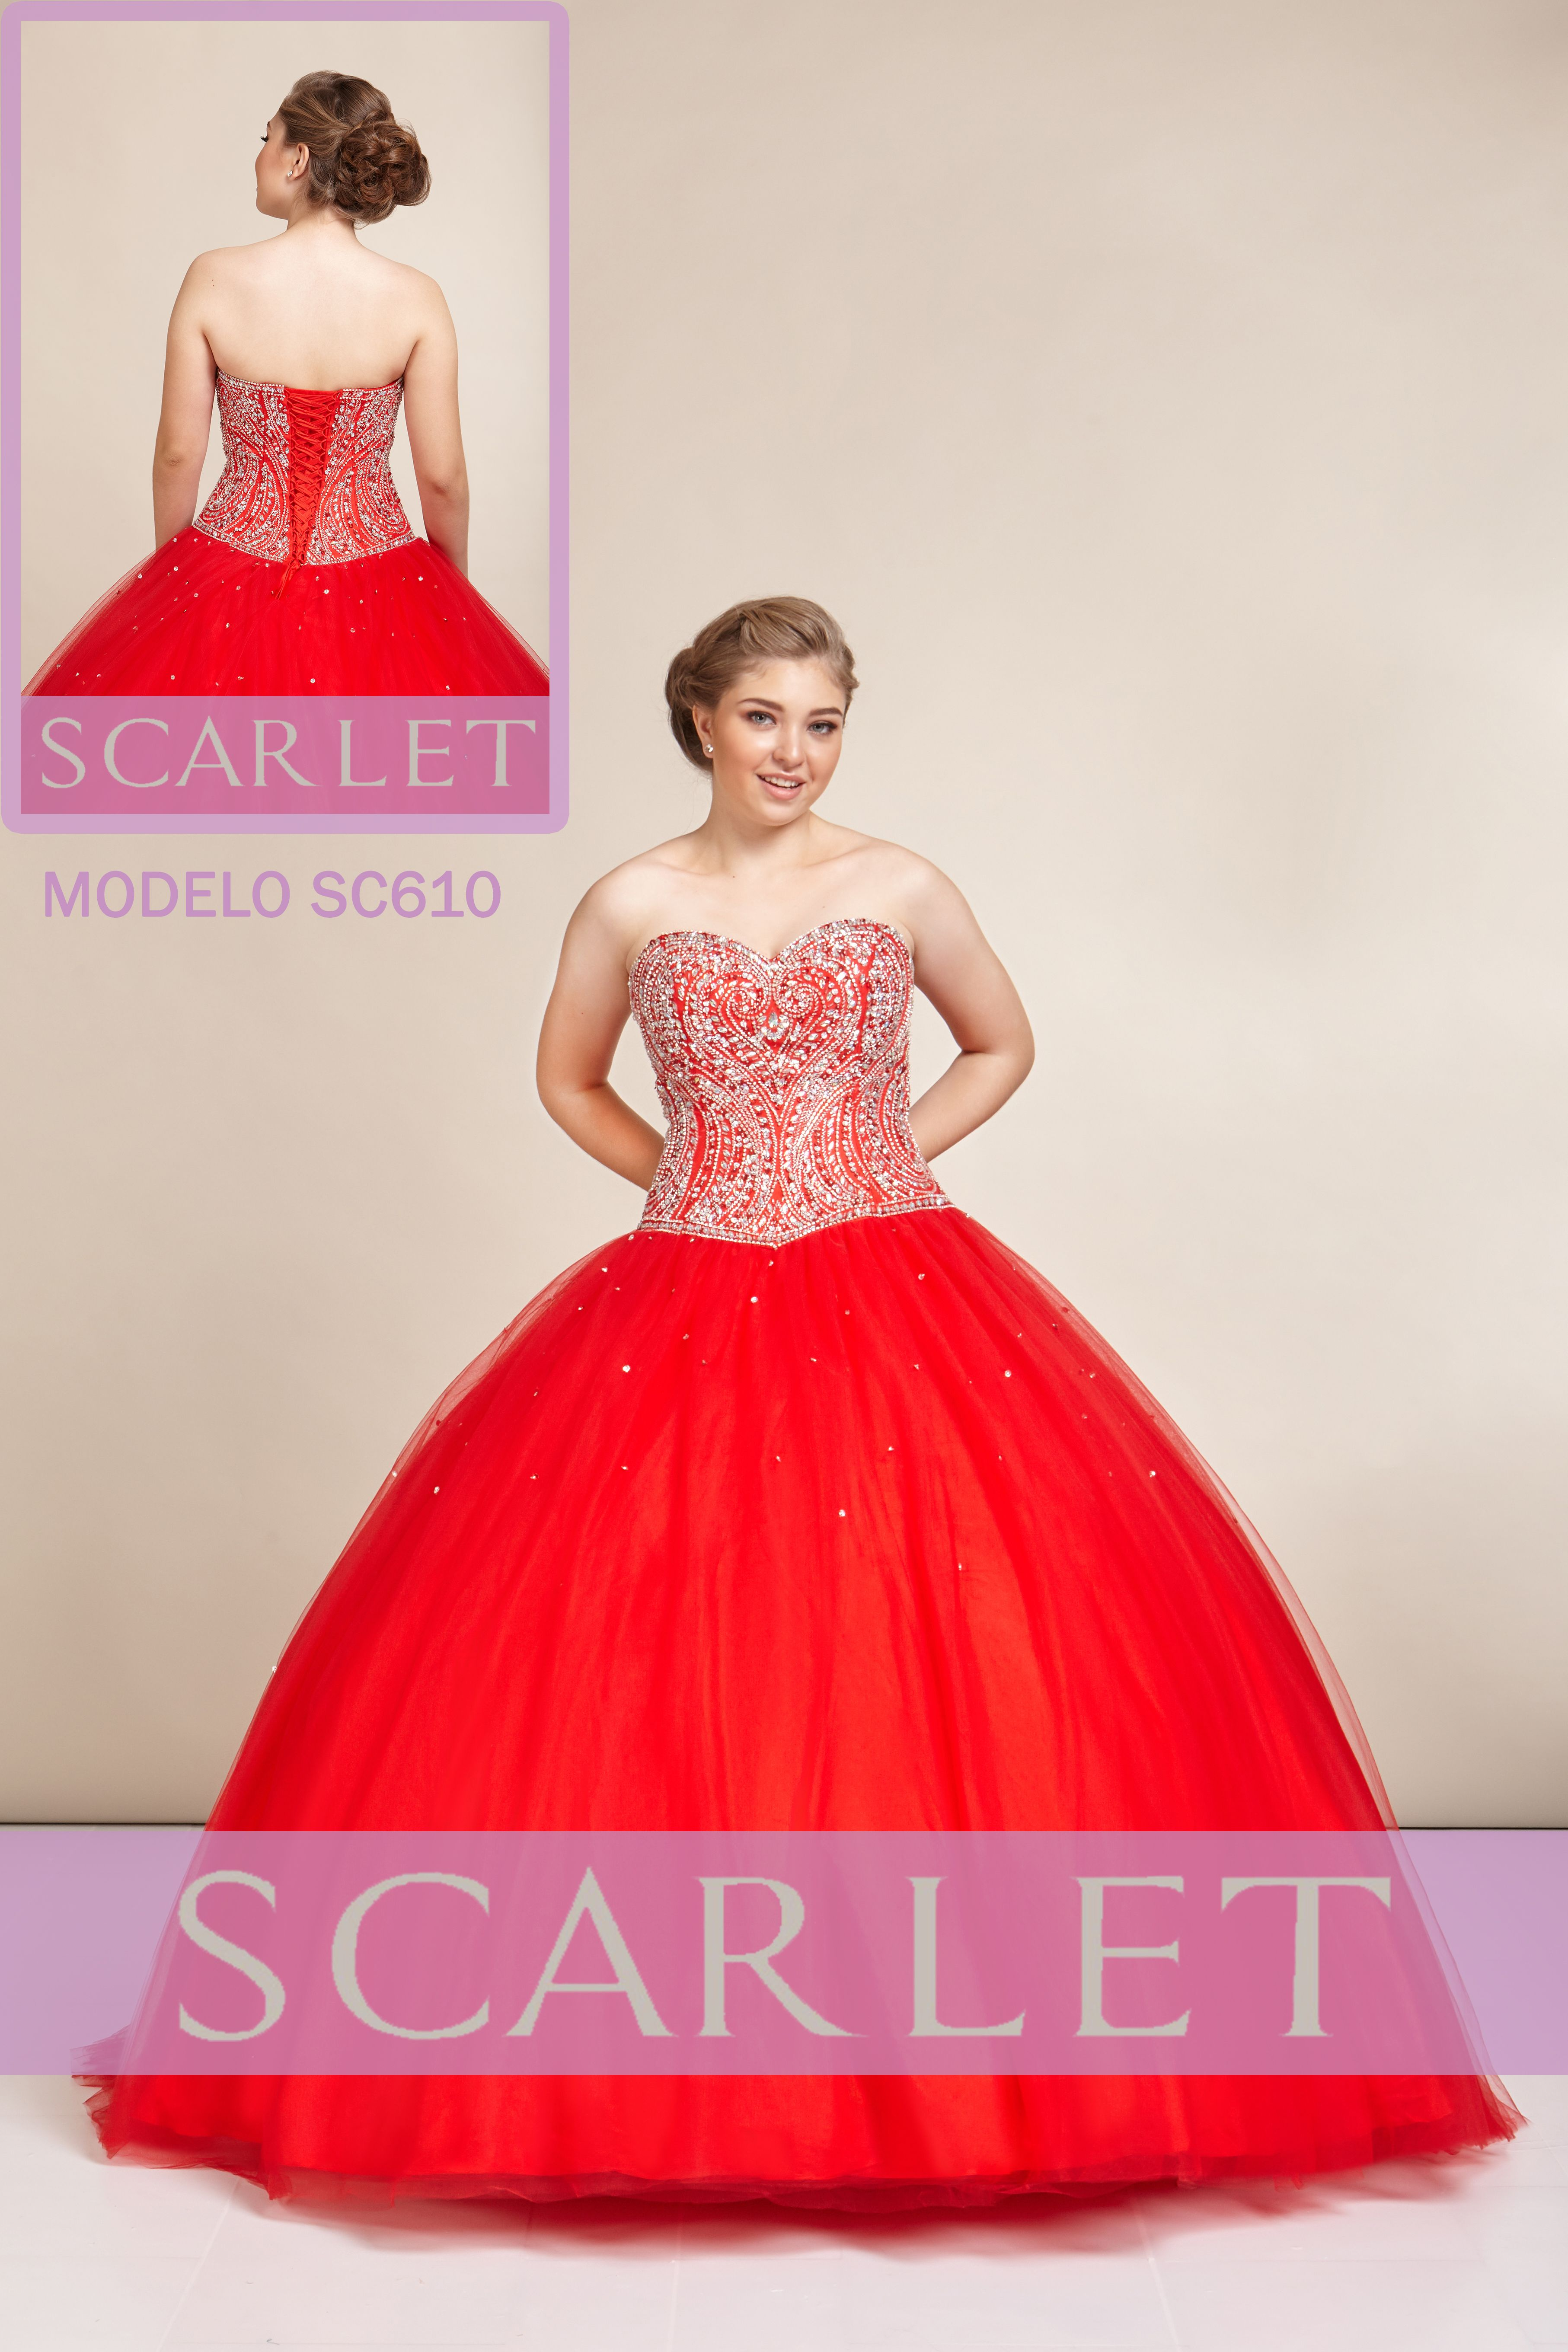 83adb2367 Asombroso vestido en corte princesa👑 strapless en escote corazón ...